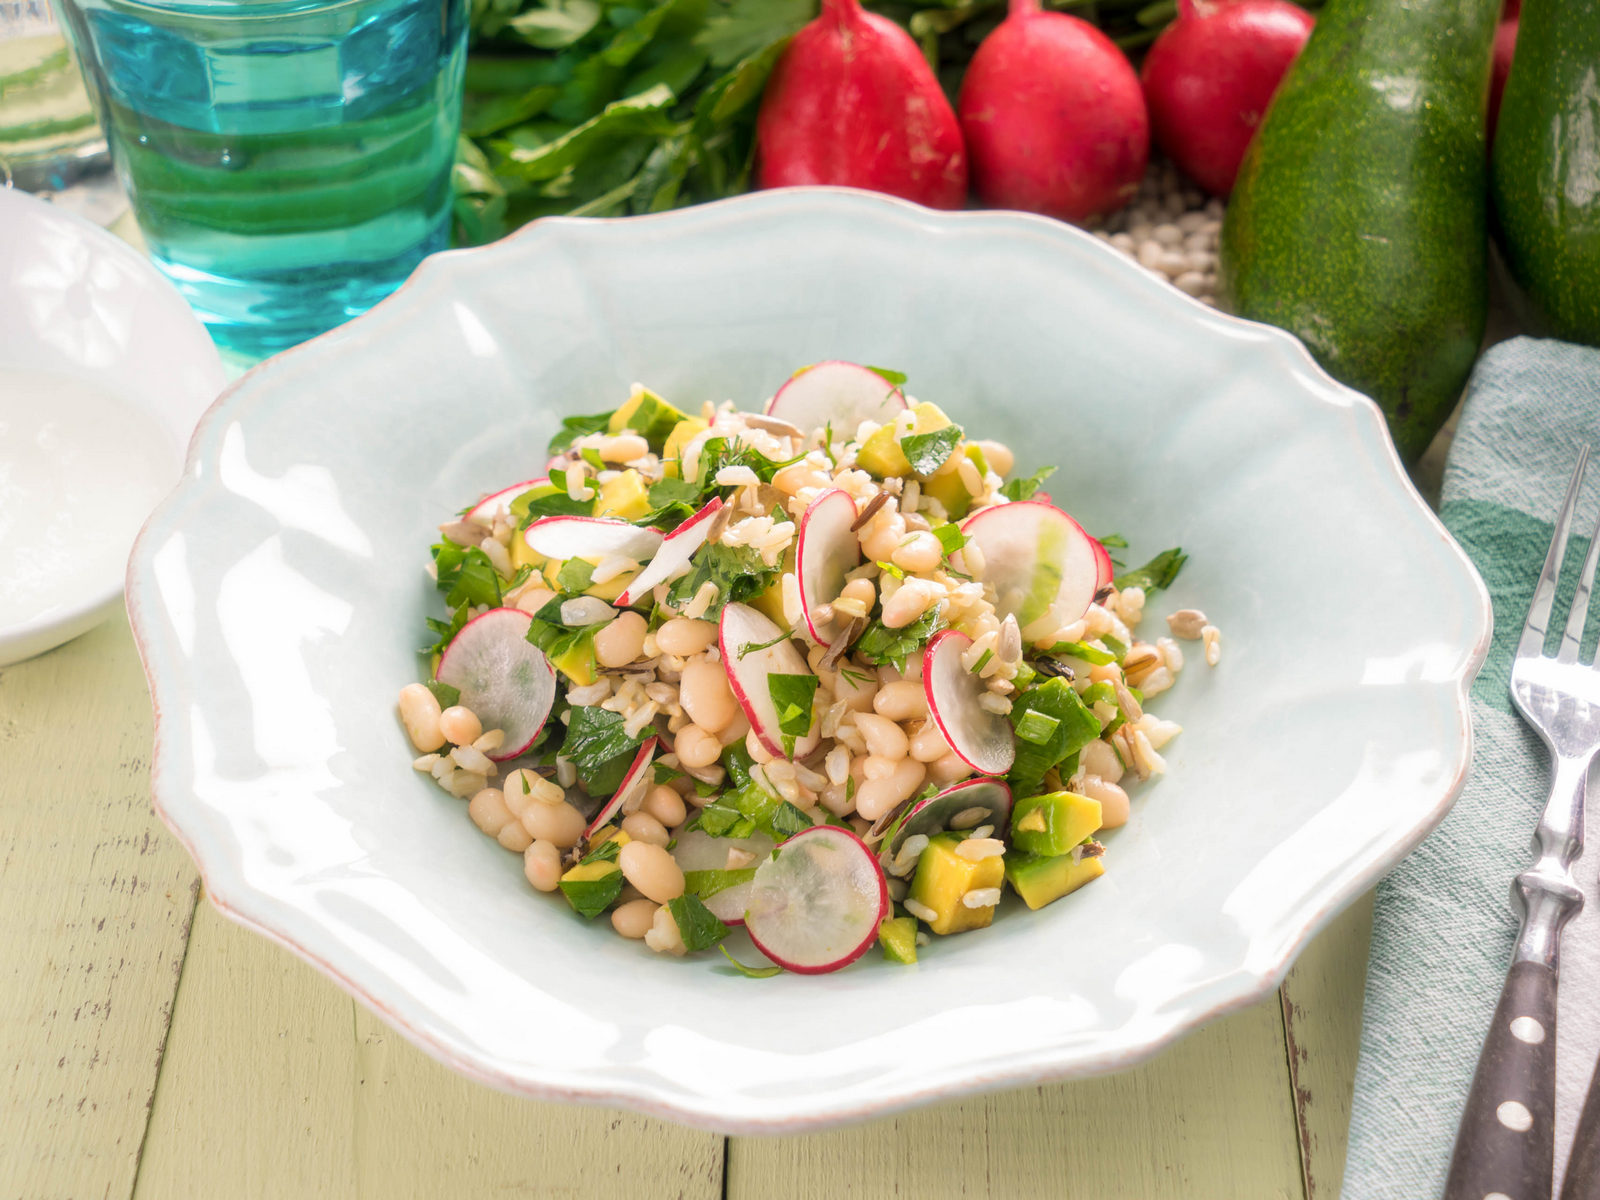 Салат с фасолью, диким рисом, авокадо и редисом